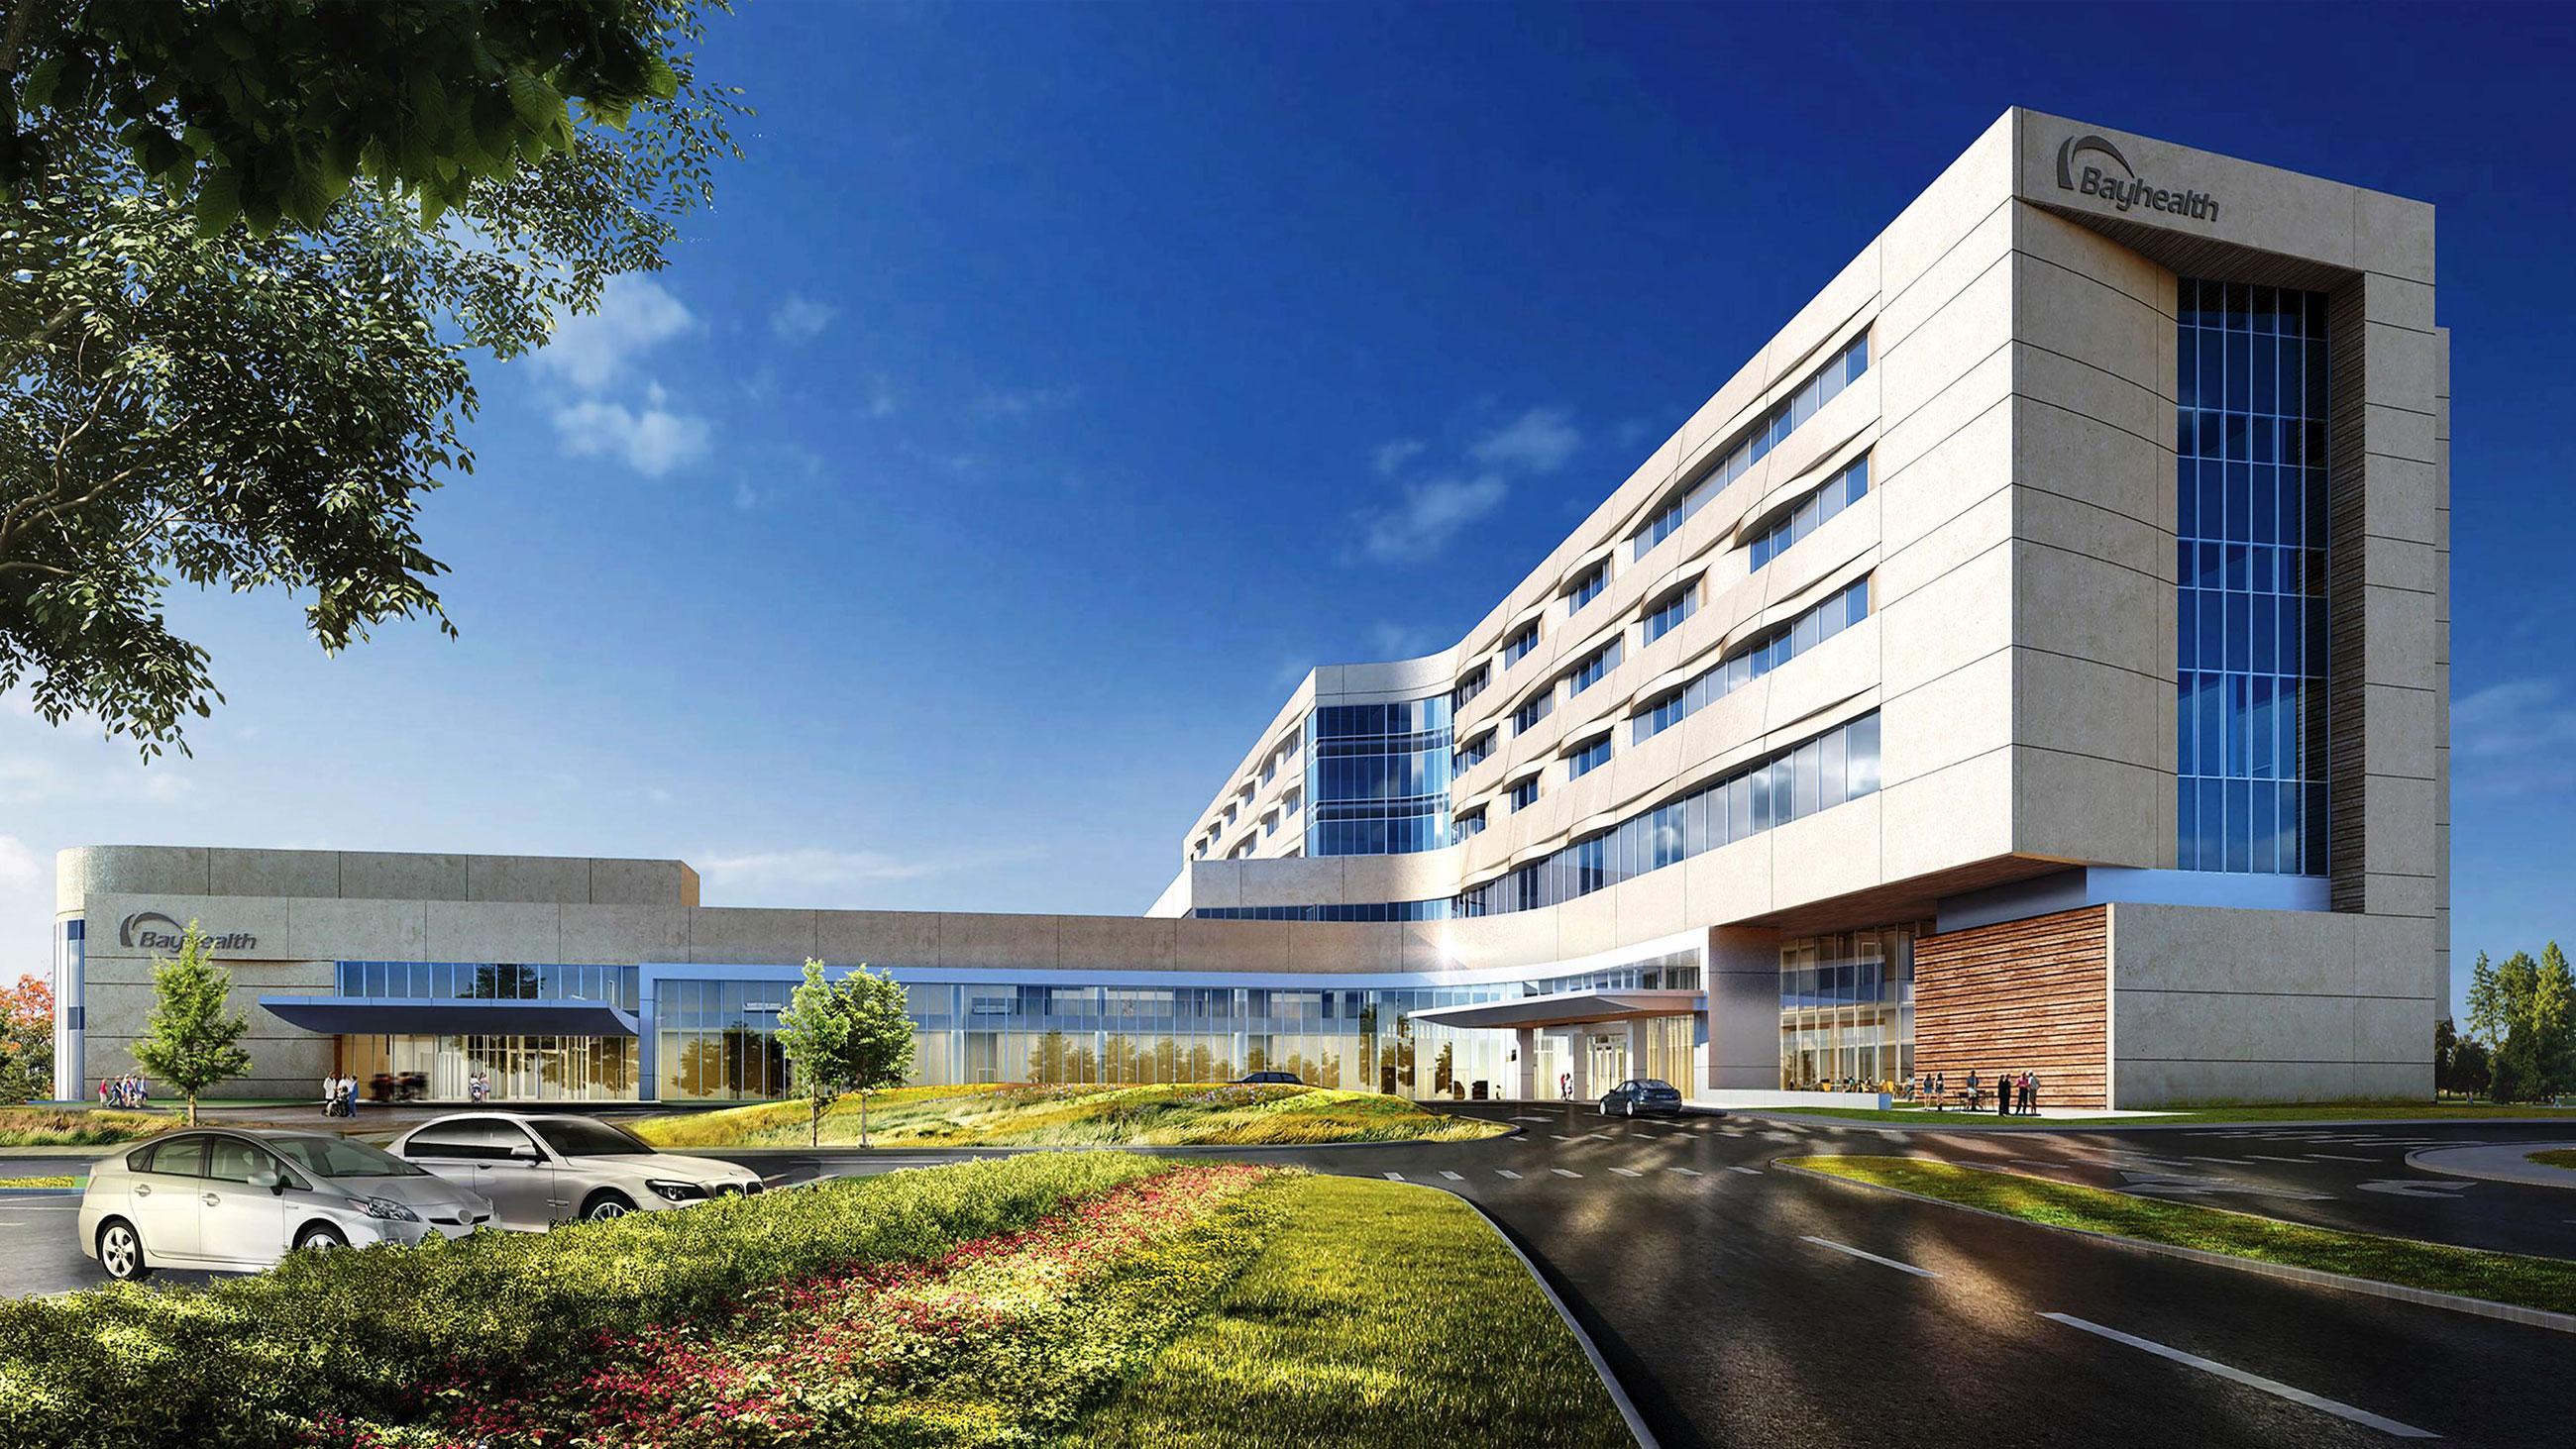 Bayhealth Hospital